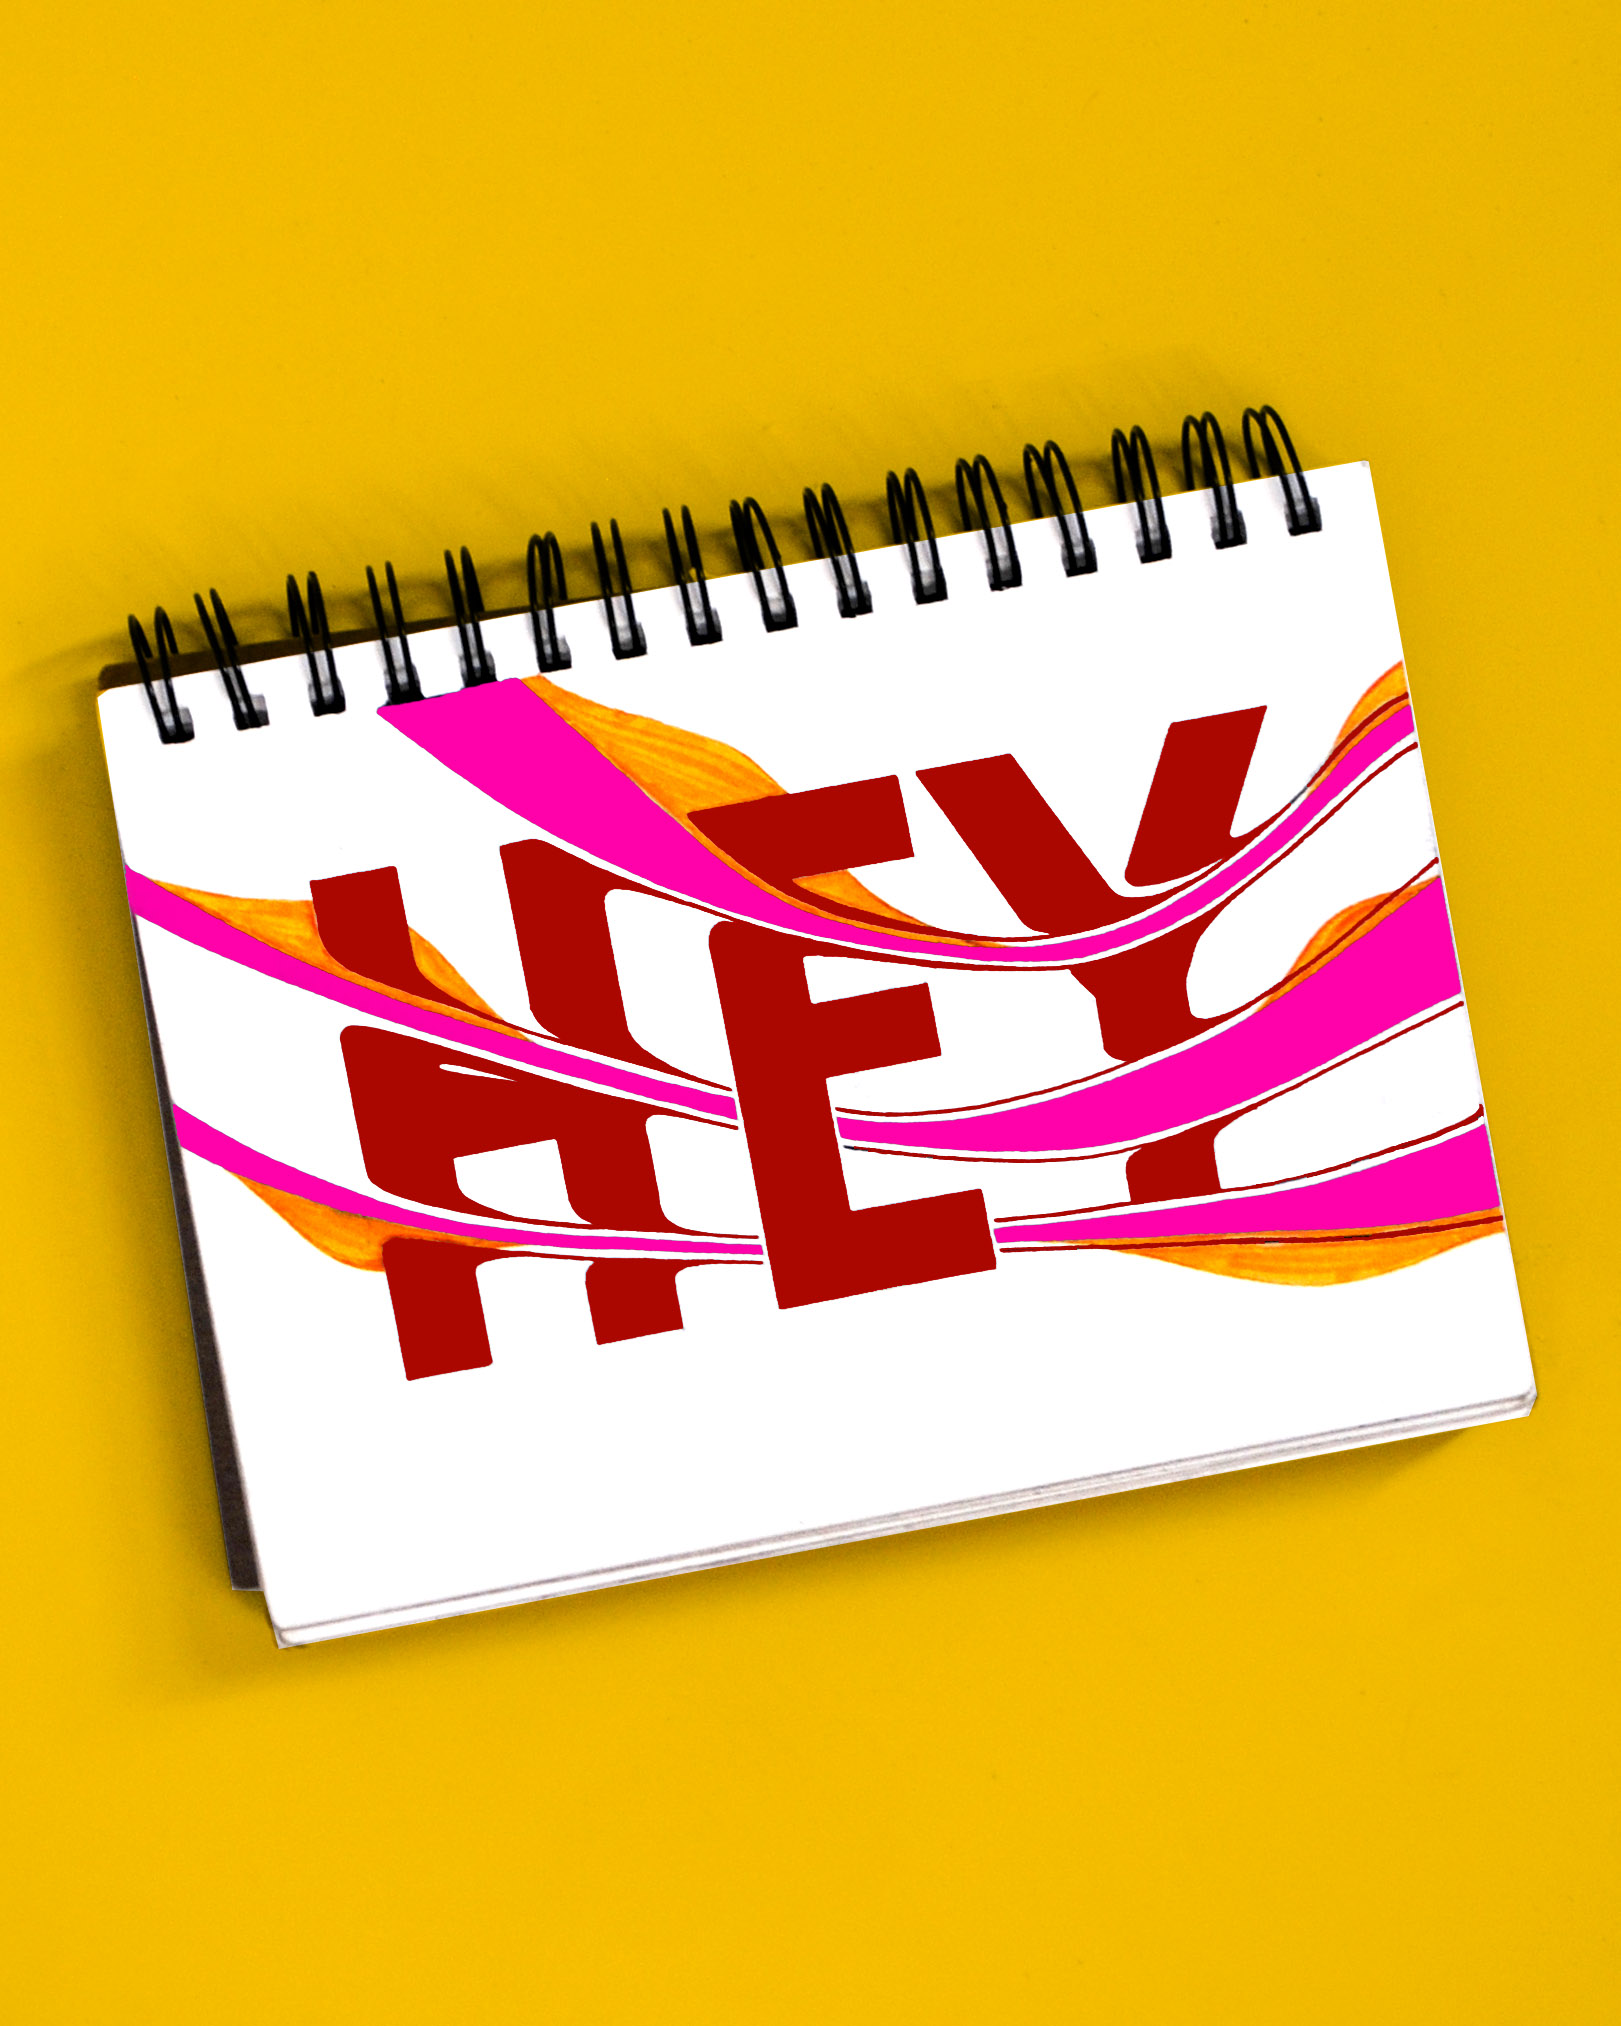 Lettering_Hey3.jpg